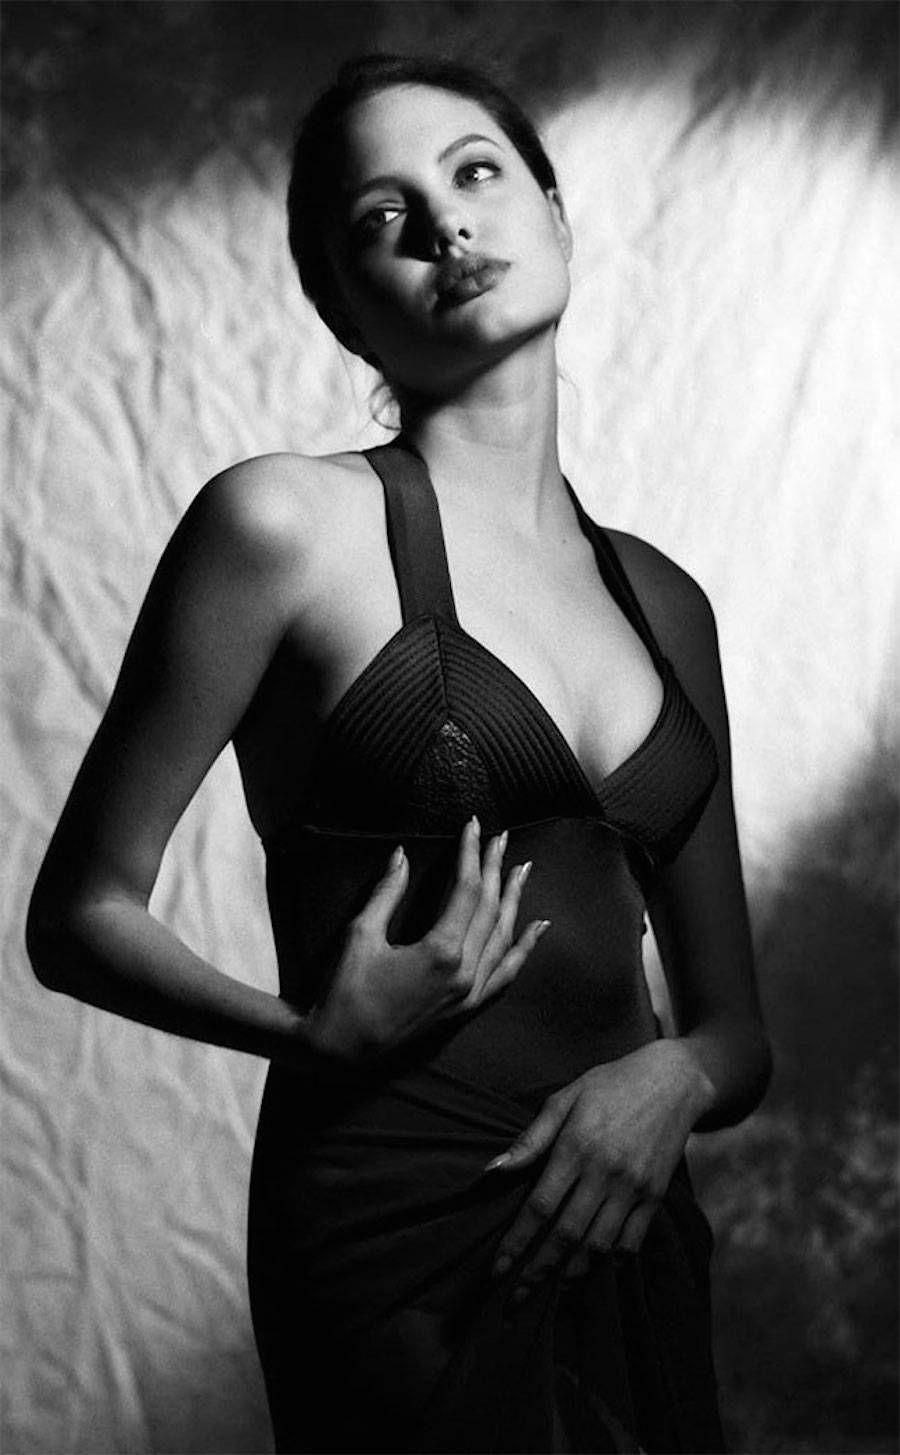 Dustin Lance čierny sex fotografie